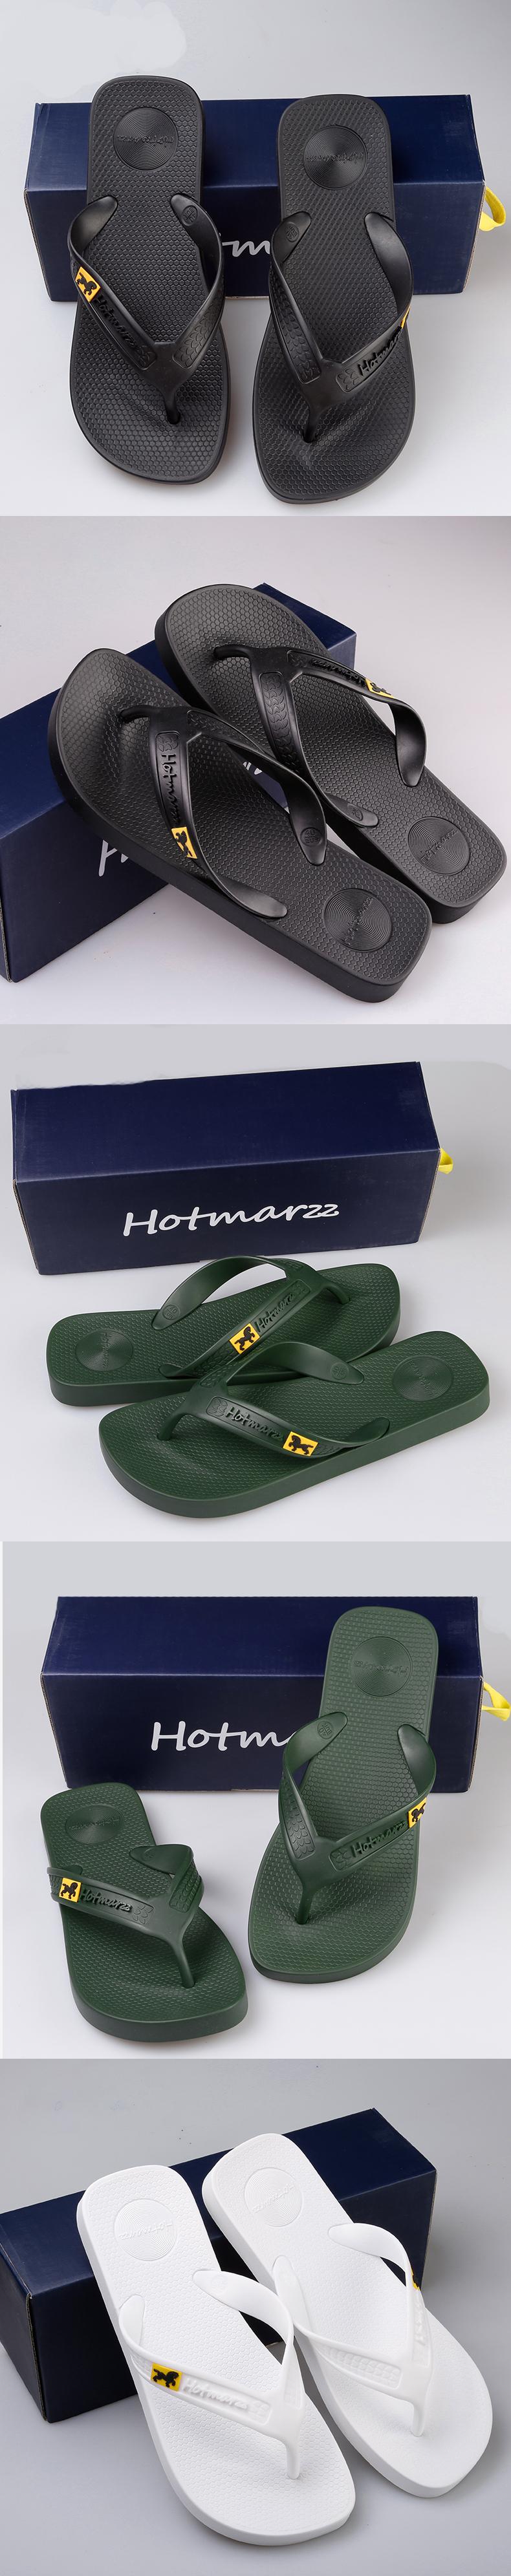 bfcba8dad923 Hotmarzz Men Flip Flops Beach Flat Sandals Designer Slippers Summer Shoes  Fashion Slides Rubber Clogs Zapatos Hombre